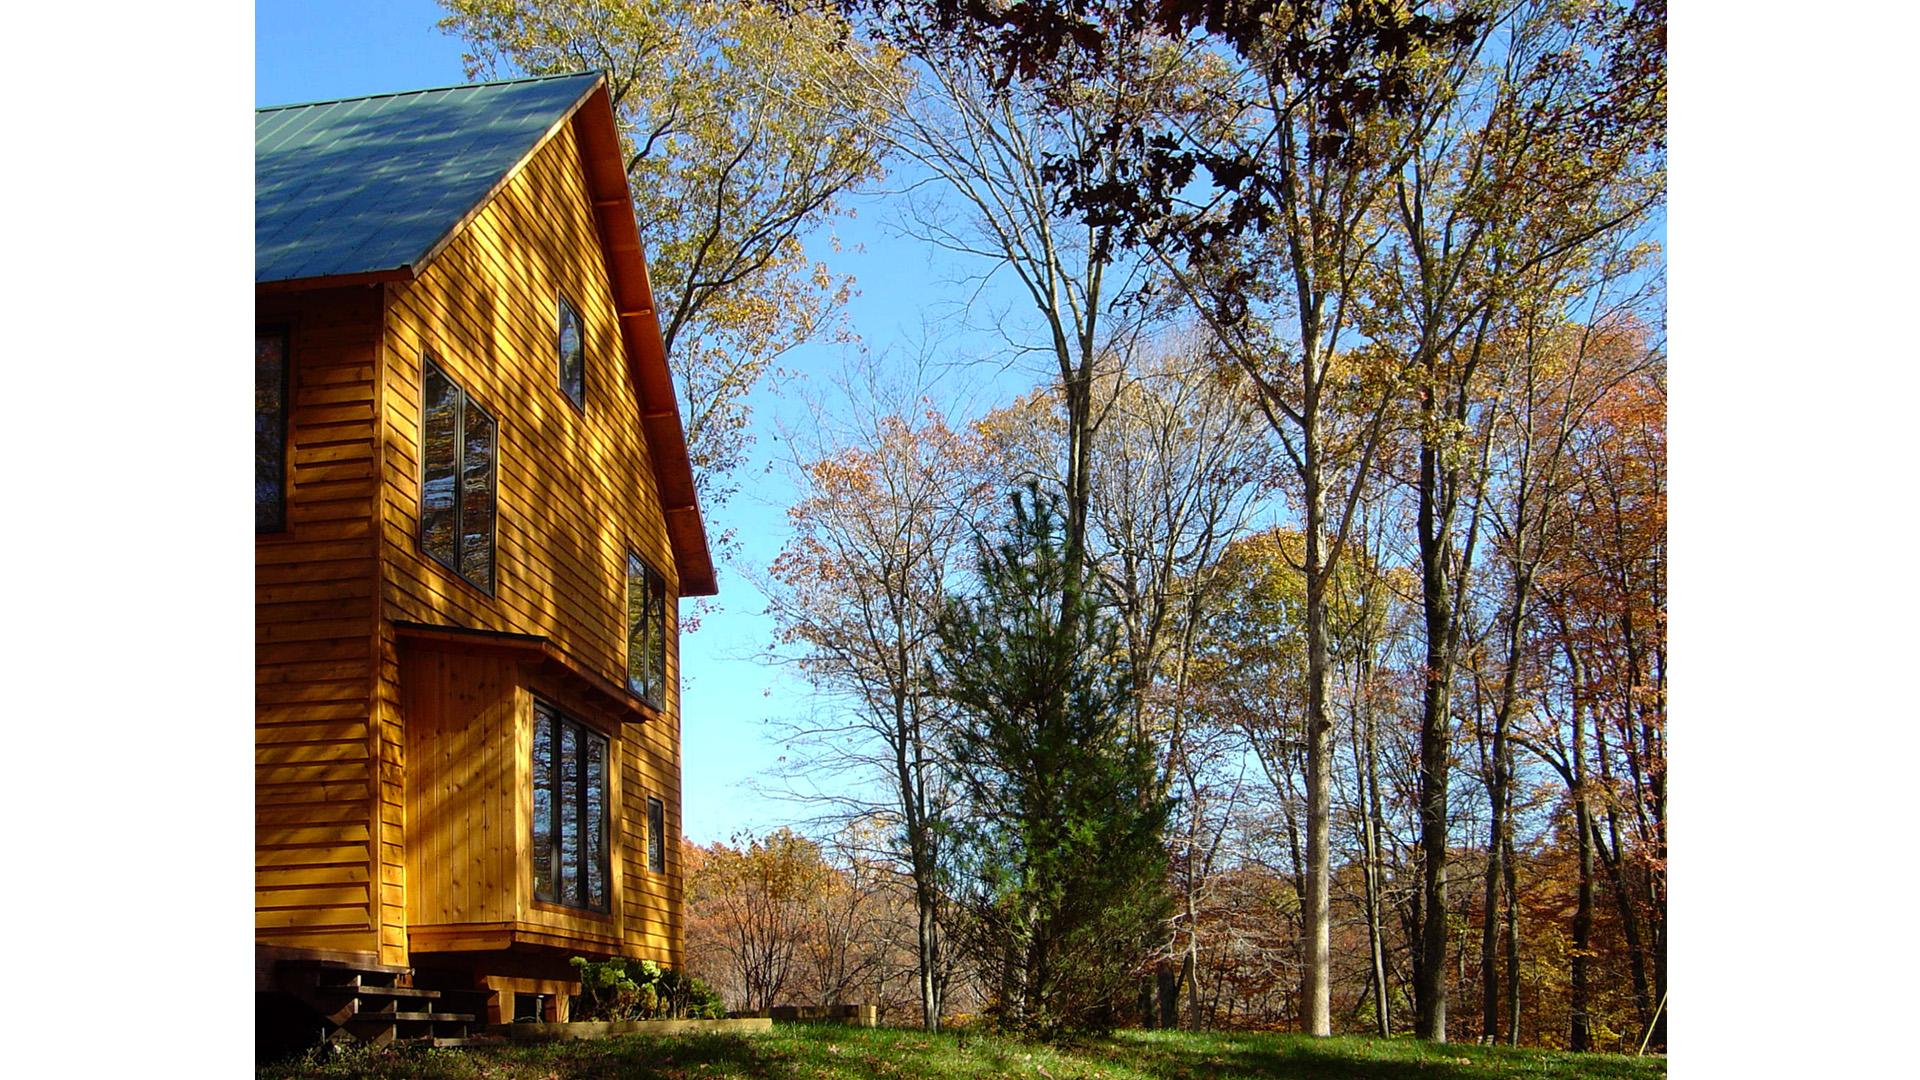 Nashville Cabin Retreat, Autumn Ridge View, HAUS Architecture, Christopher Short, Indianapolis Architect